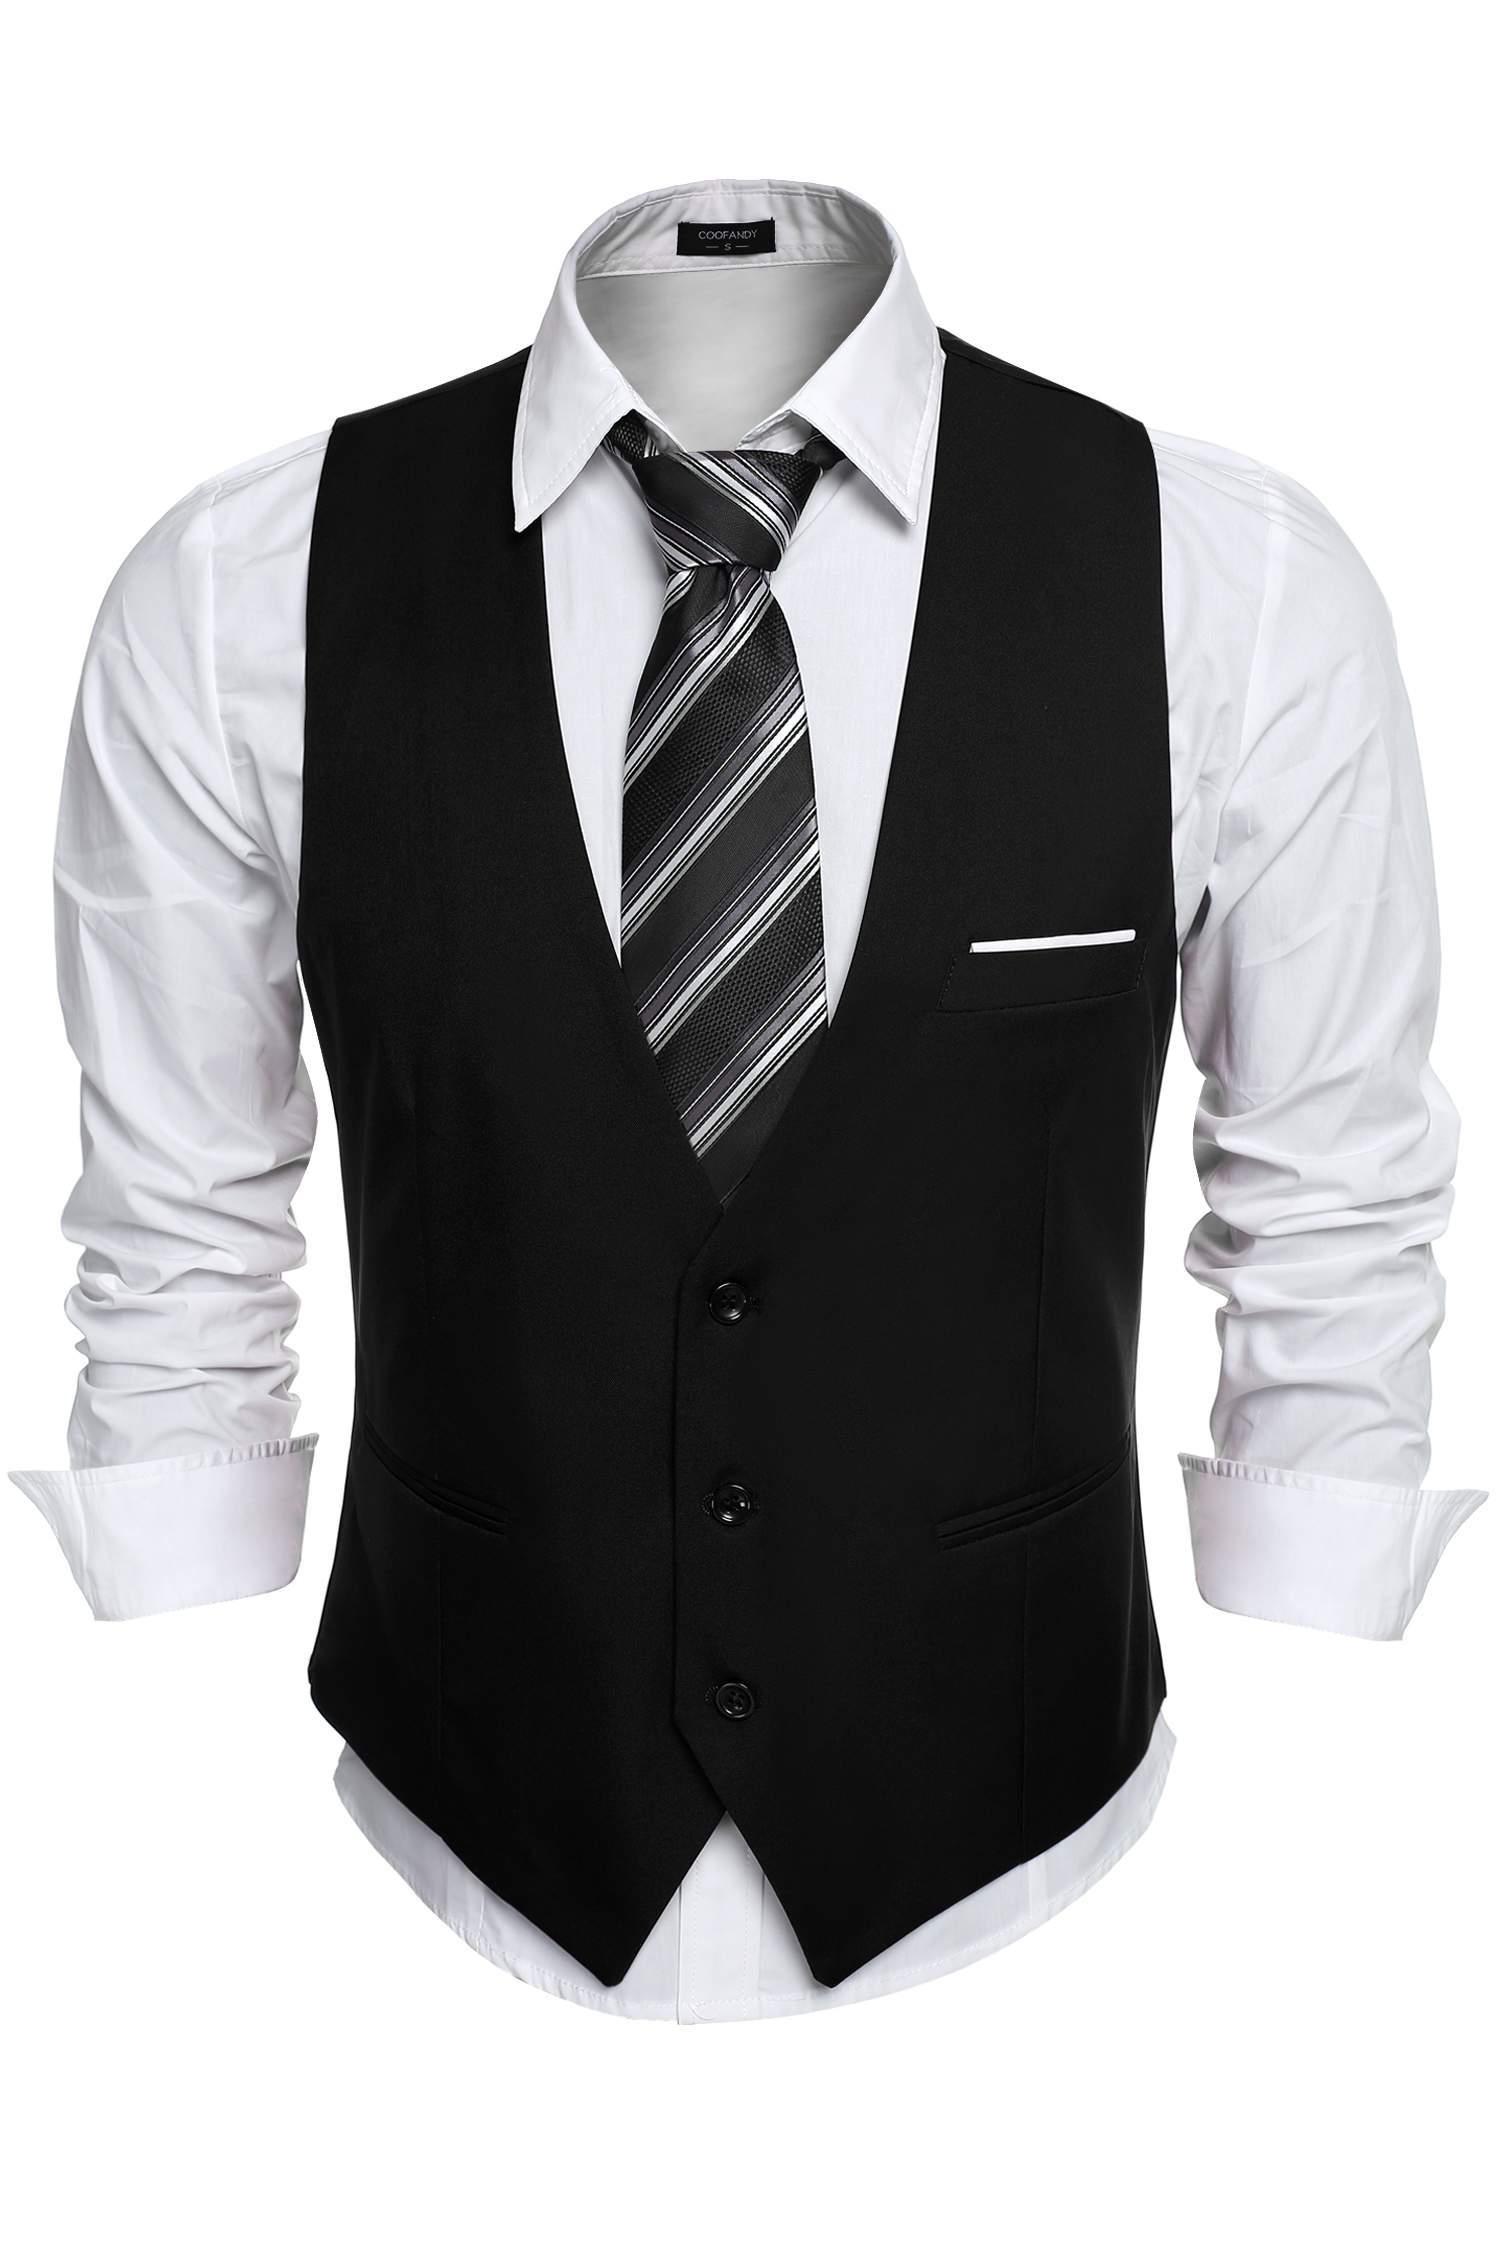 Loveje Men's Waistcoat Casual Sleeveless Slim Fit Vest Business Suit Dress Vest